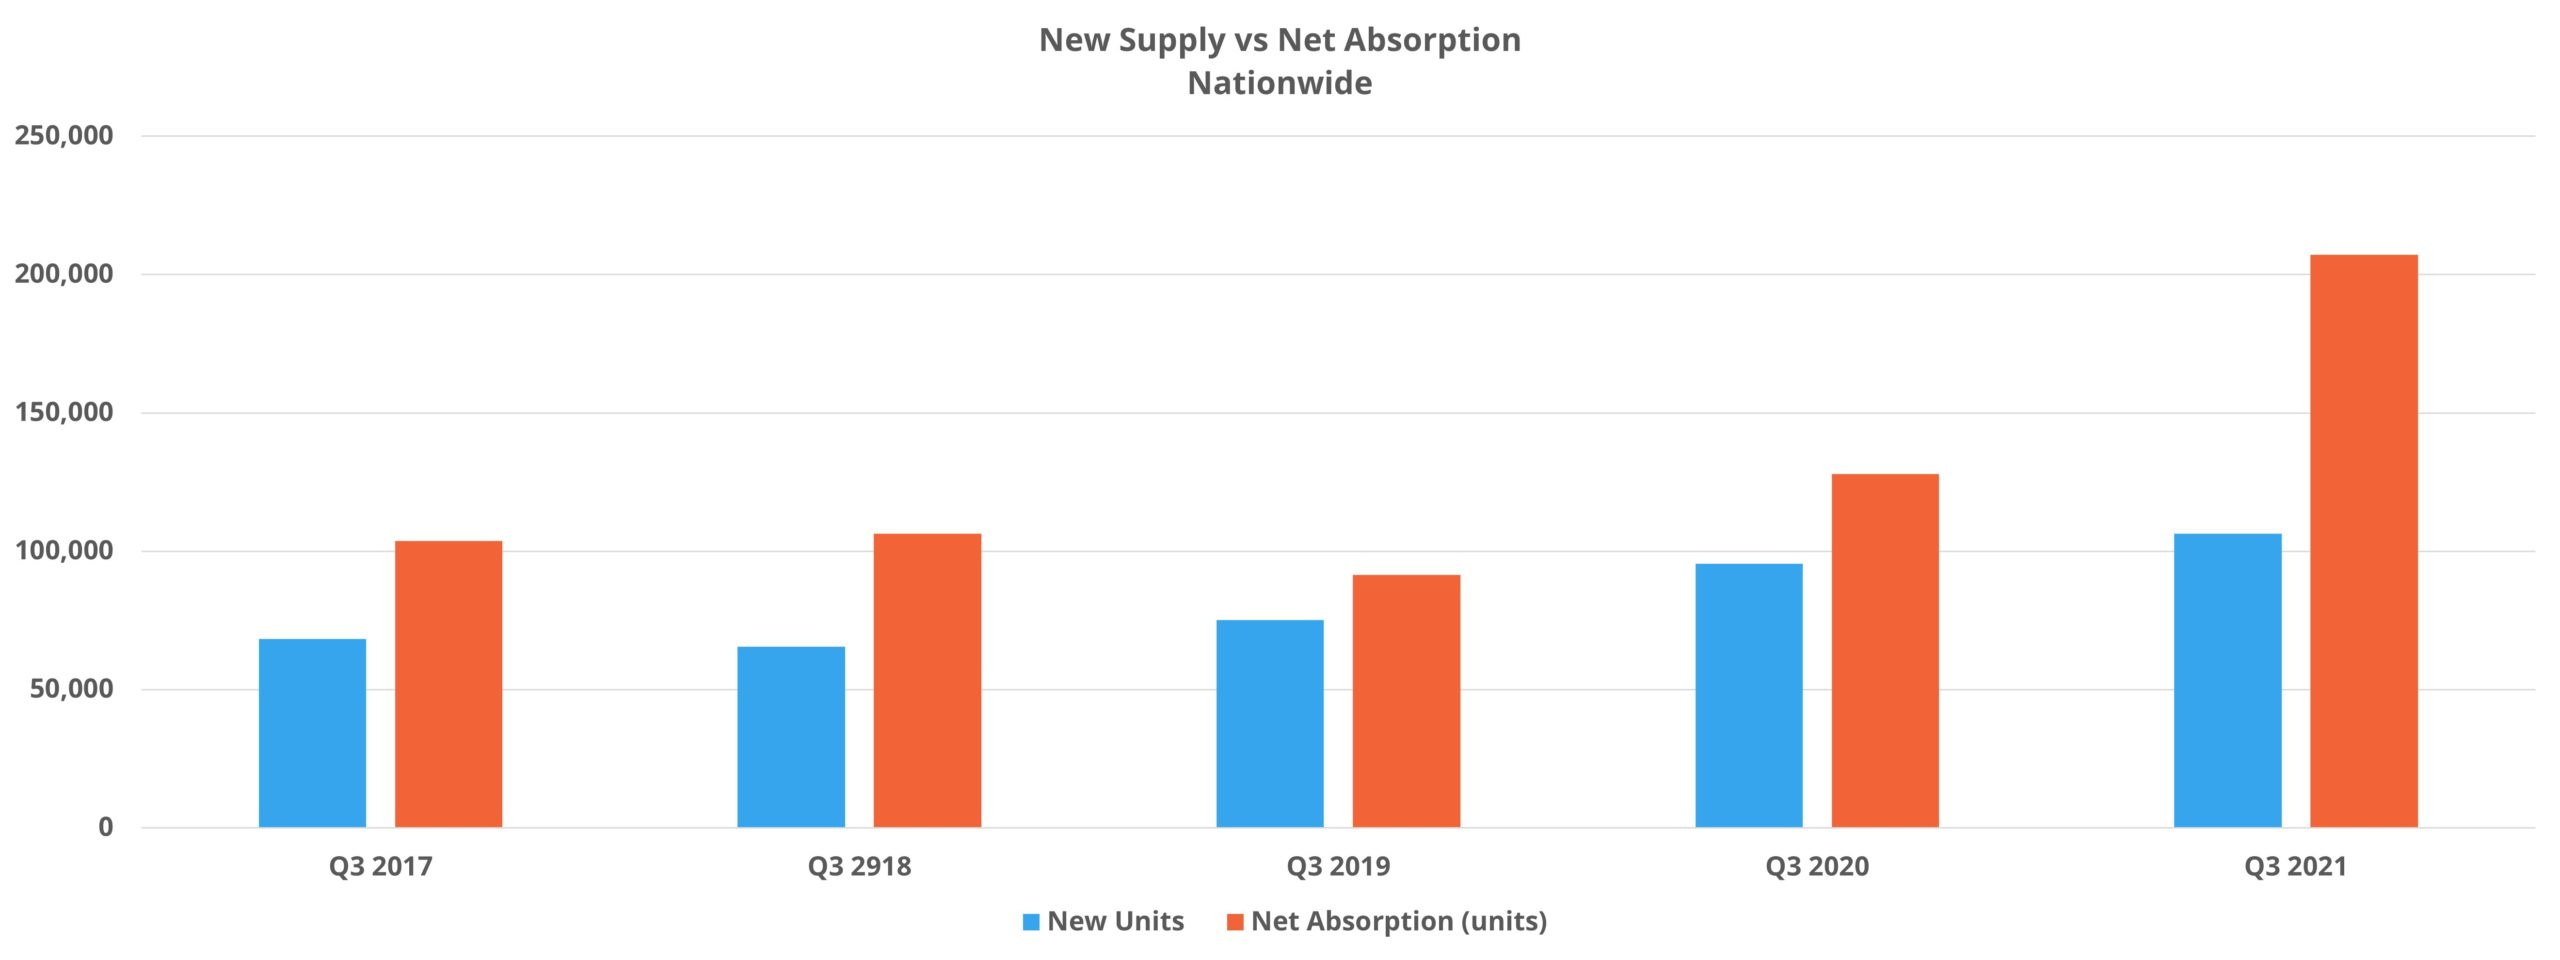 New Supply vs Net Absorption